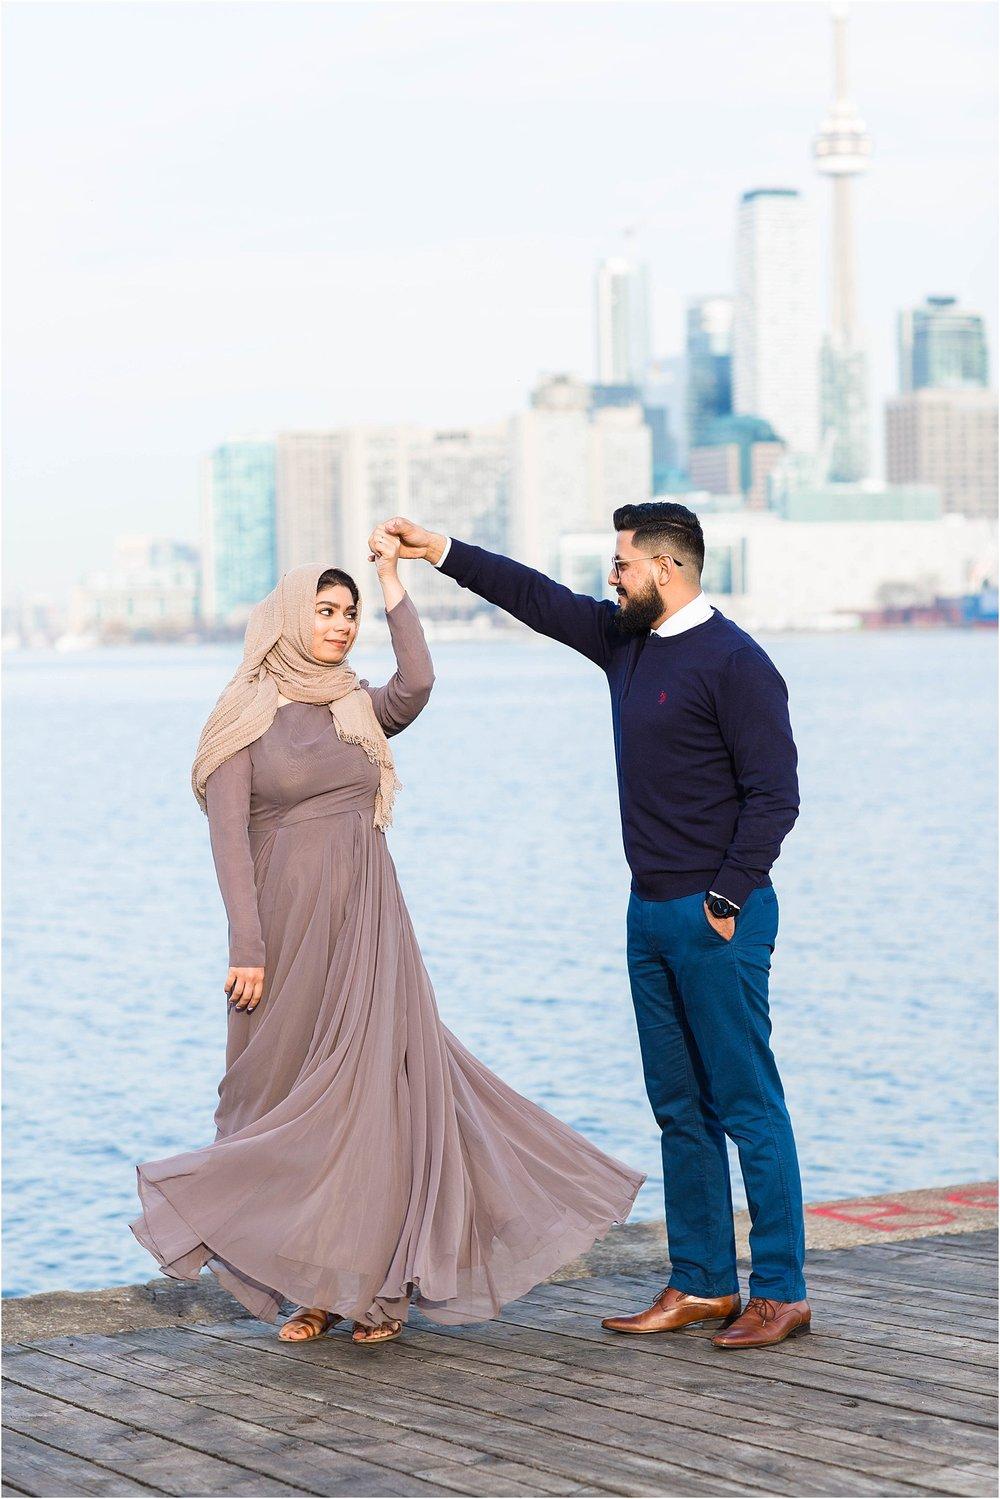 Polson-Pier-Distillery-District-Engagement-Session-Toronto-Mississauga-Brampton-Scarborough-GTA-Pakistani-Indian-Wedding-Engagement-Photographer-Photography_0012.jpg